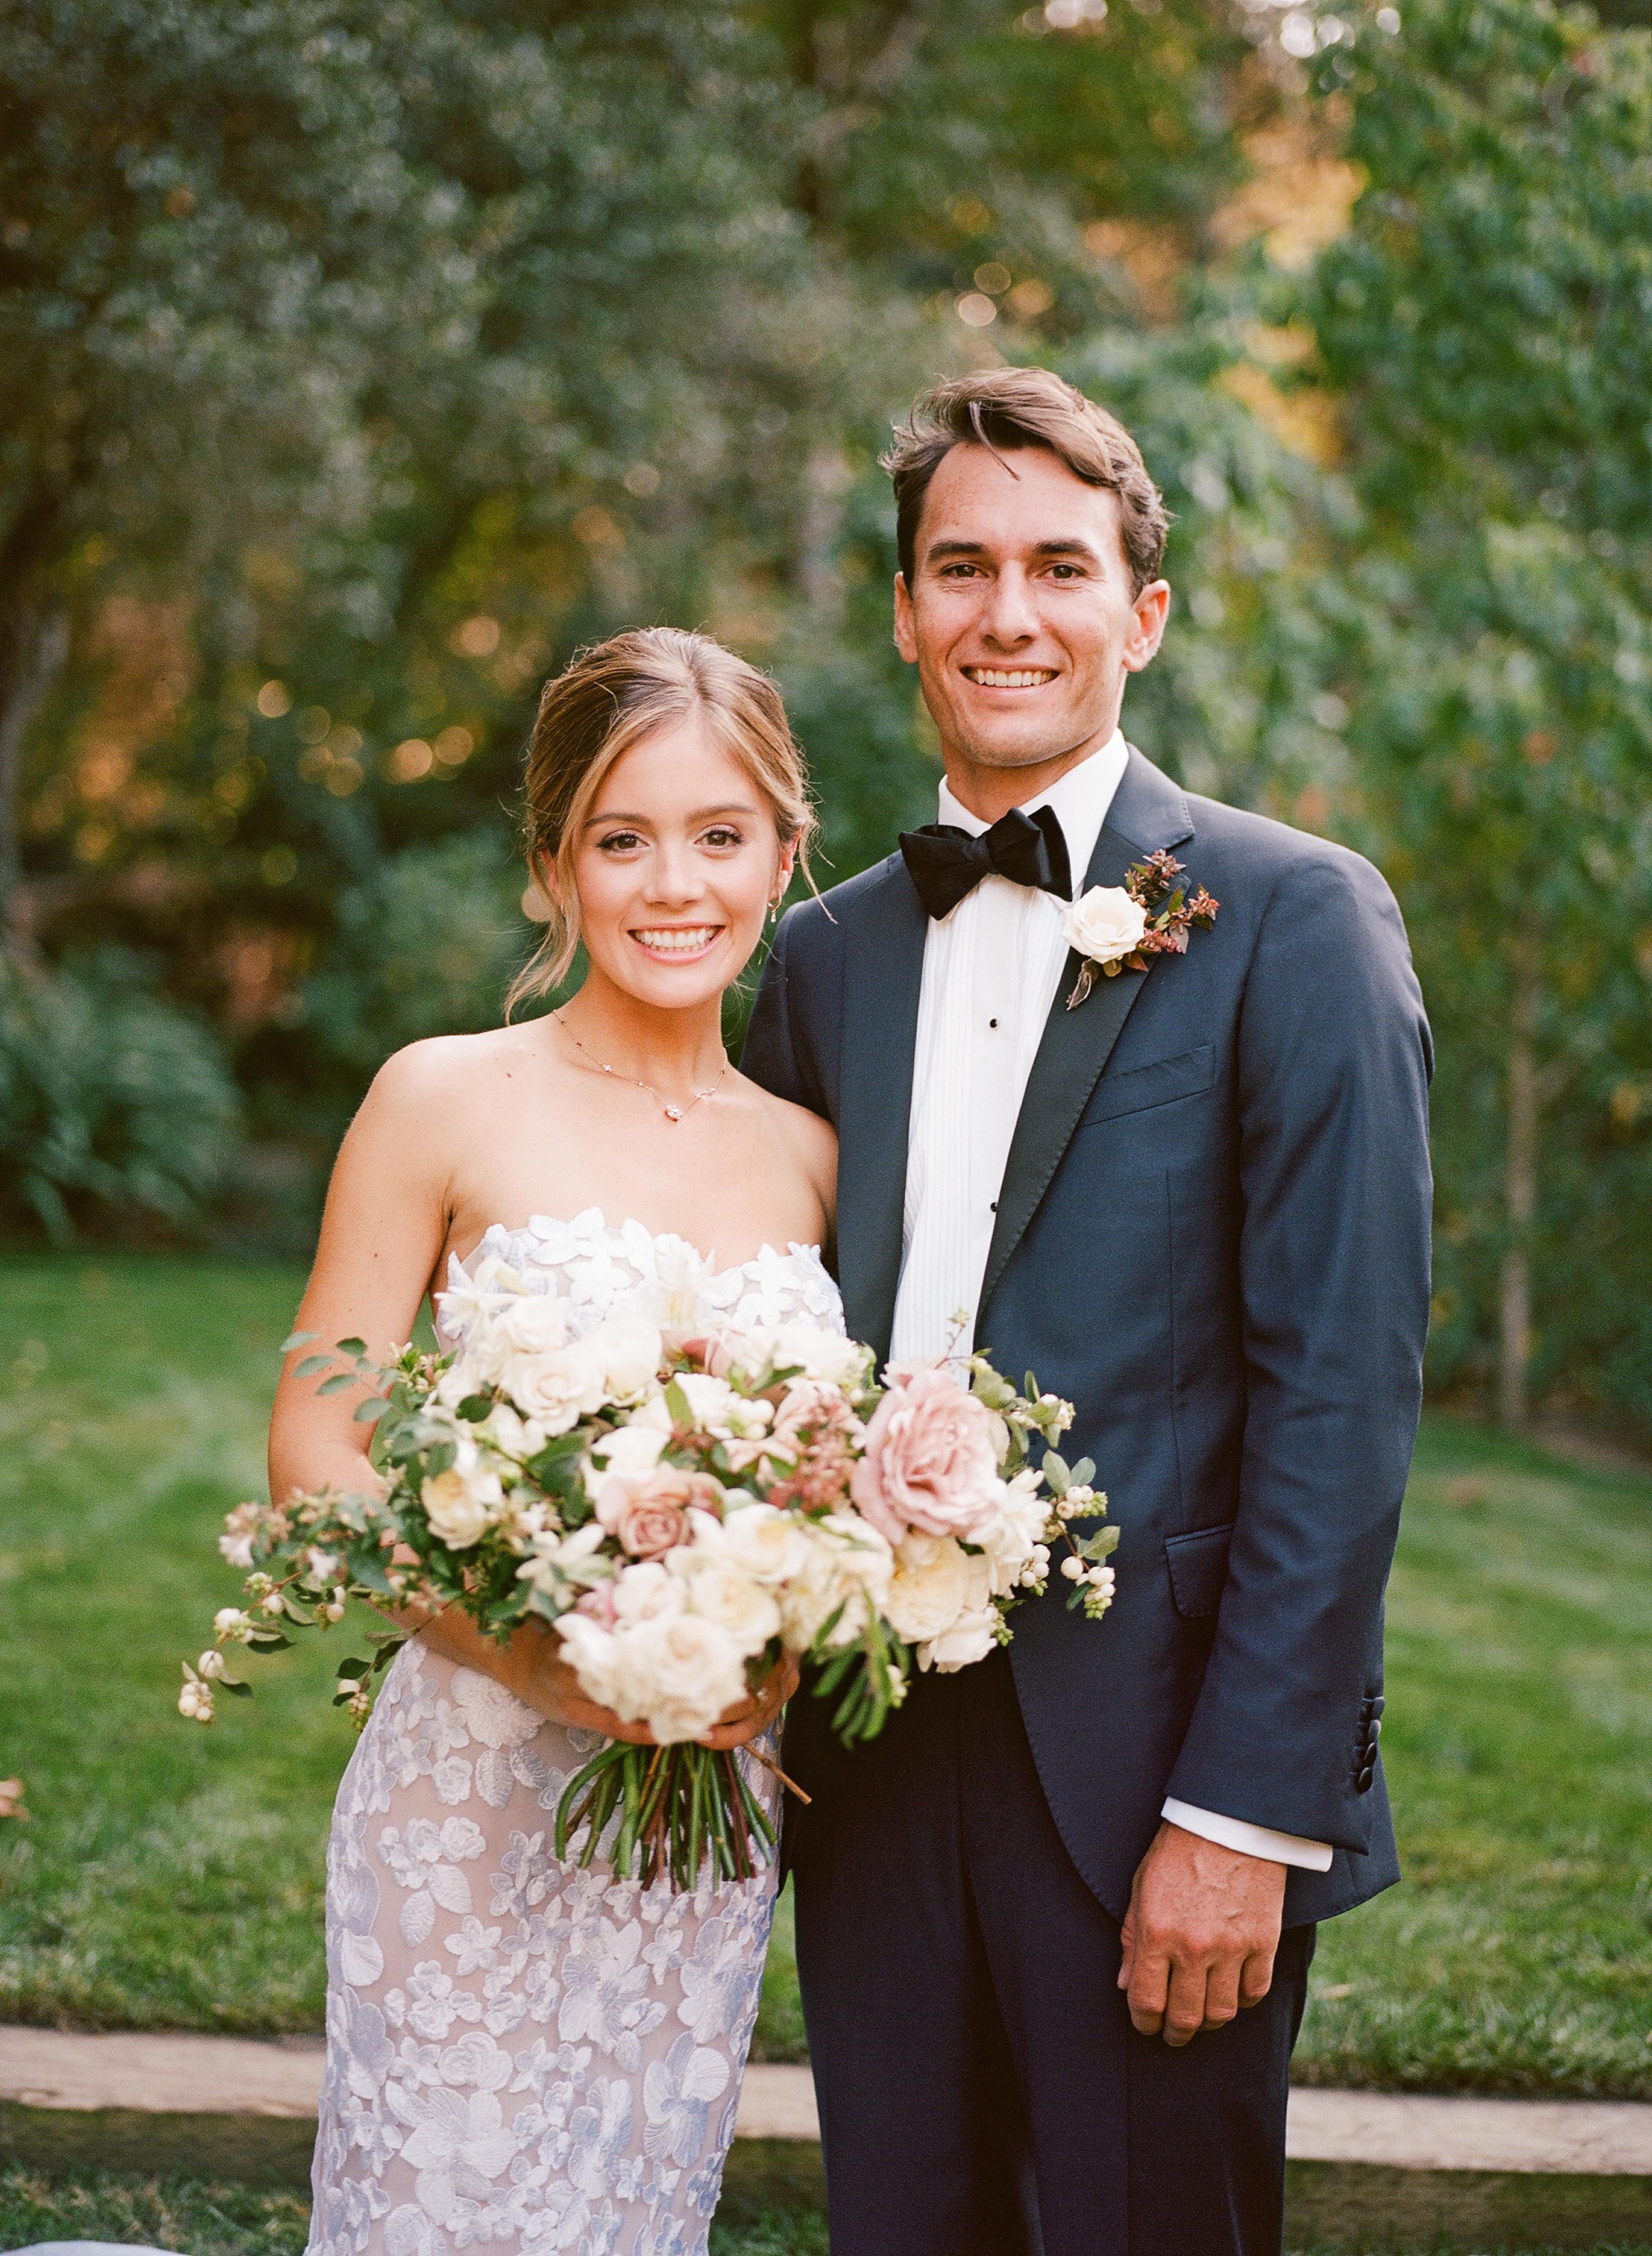 caitlin michael wedding couple